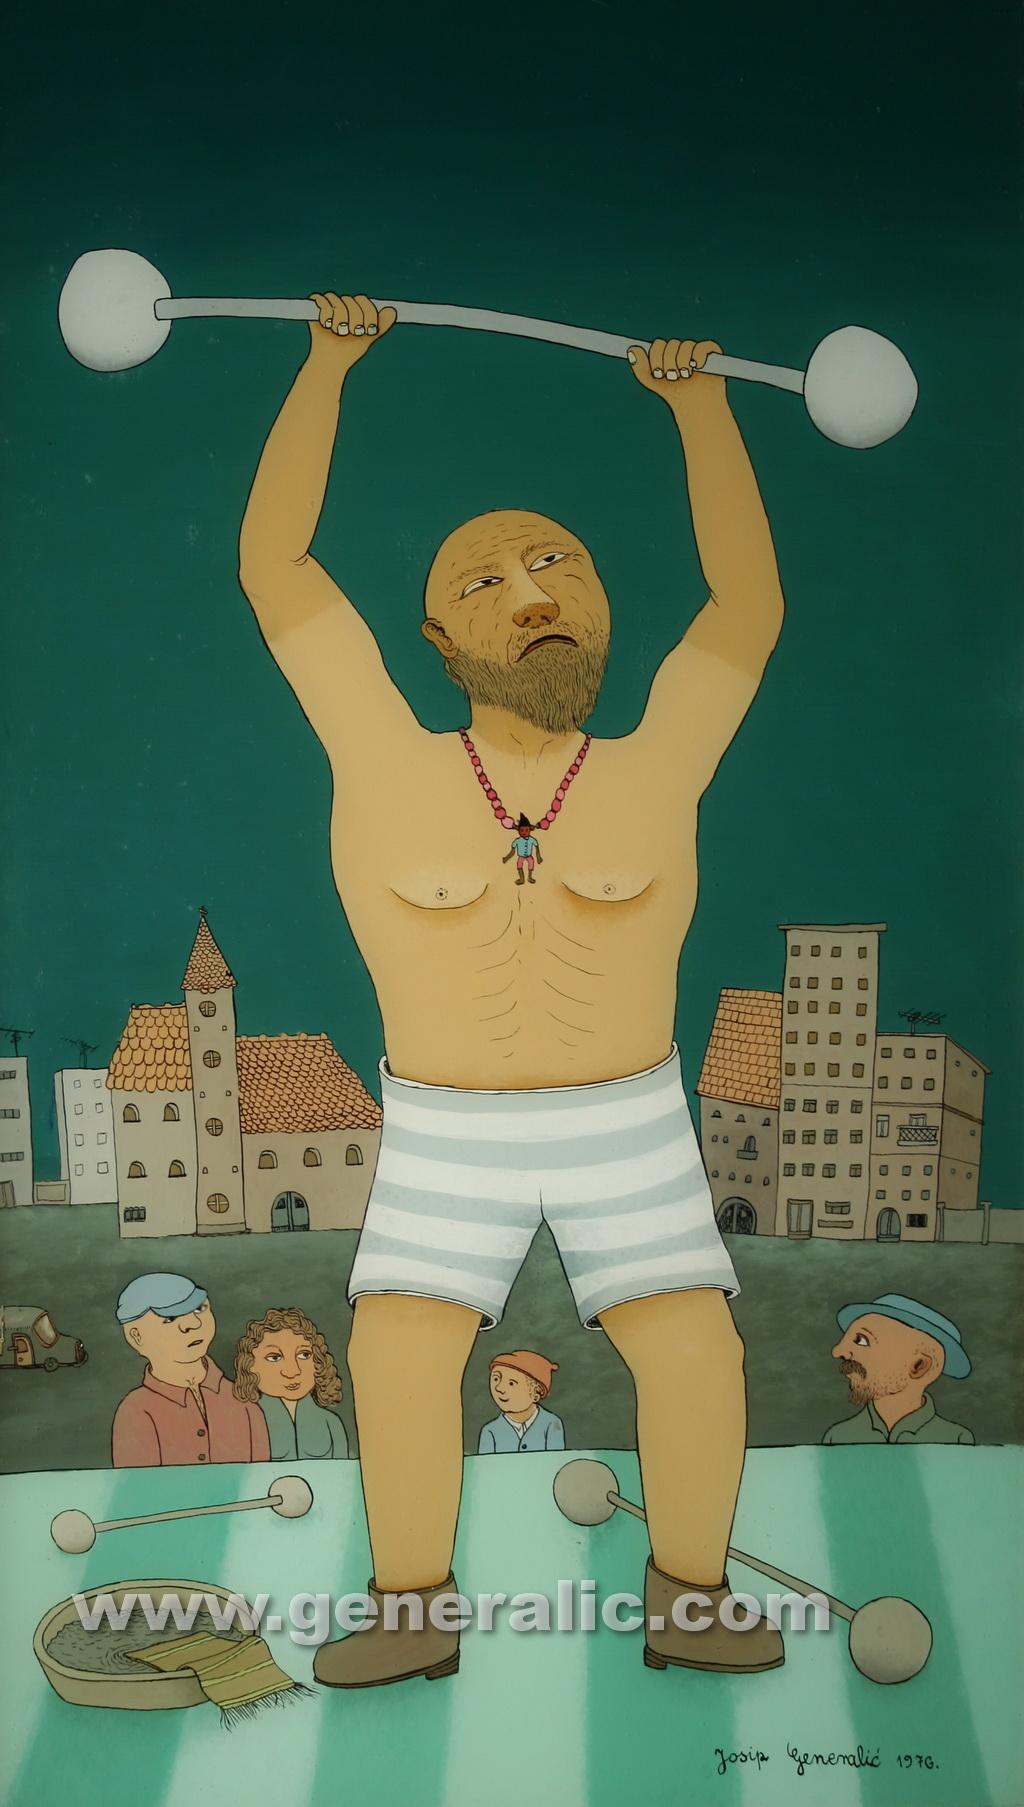 Josip Generalic, 1976, Weight lifting, oil on glass, 66x38 cm